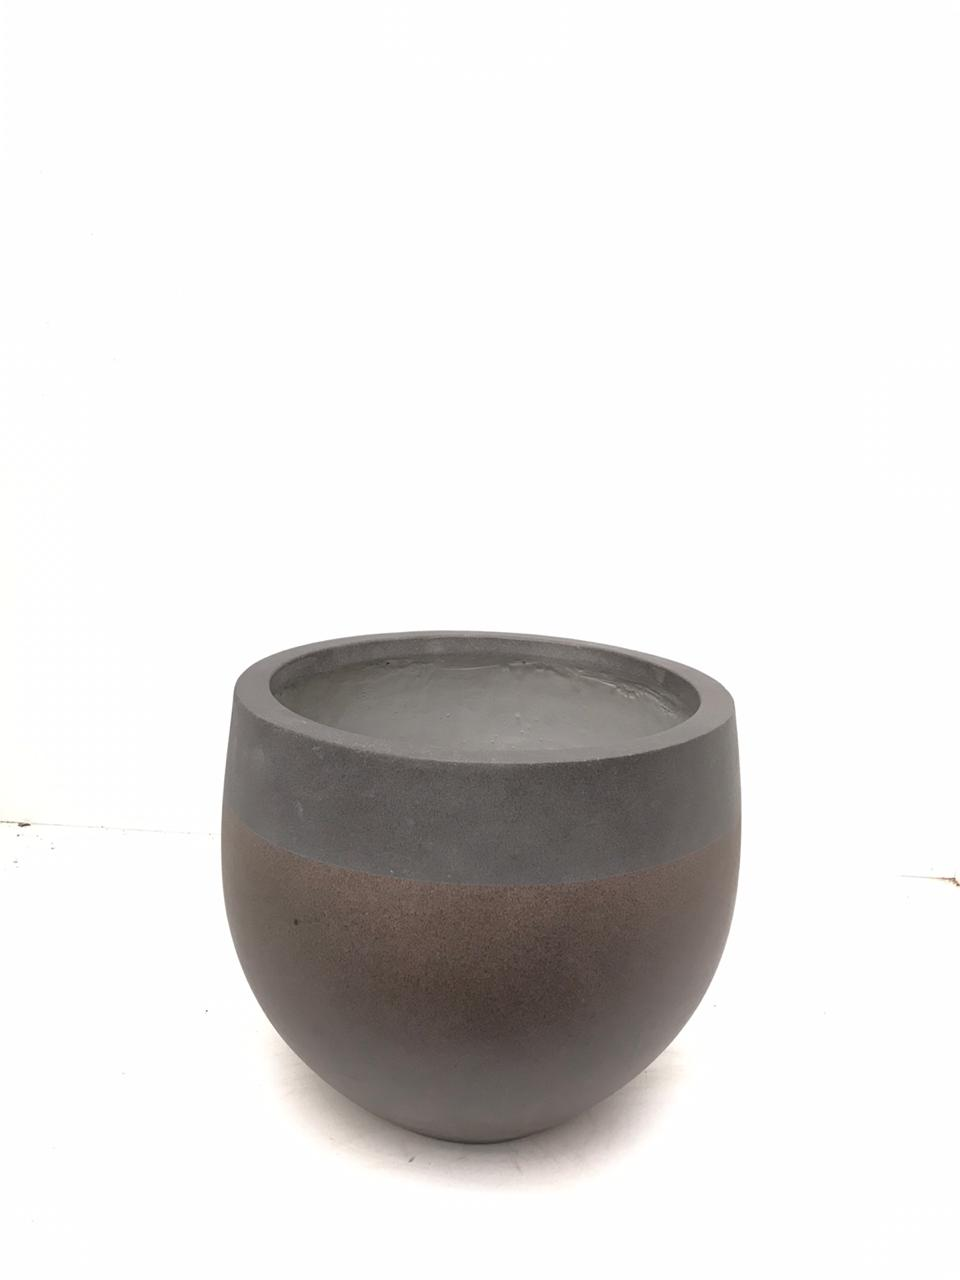 وعاء دائري بلونين - صغير أواني و مزهريات